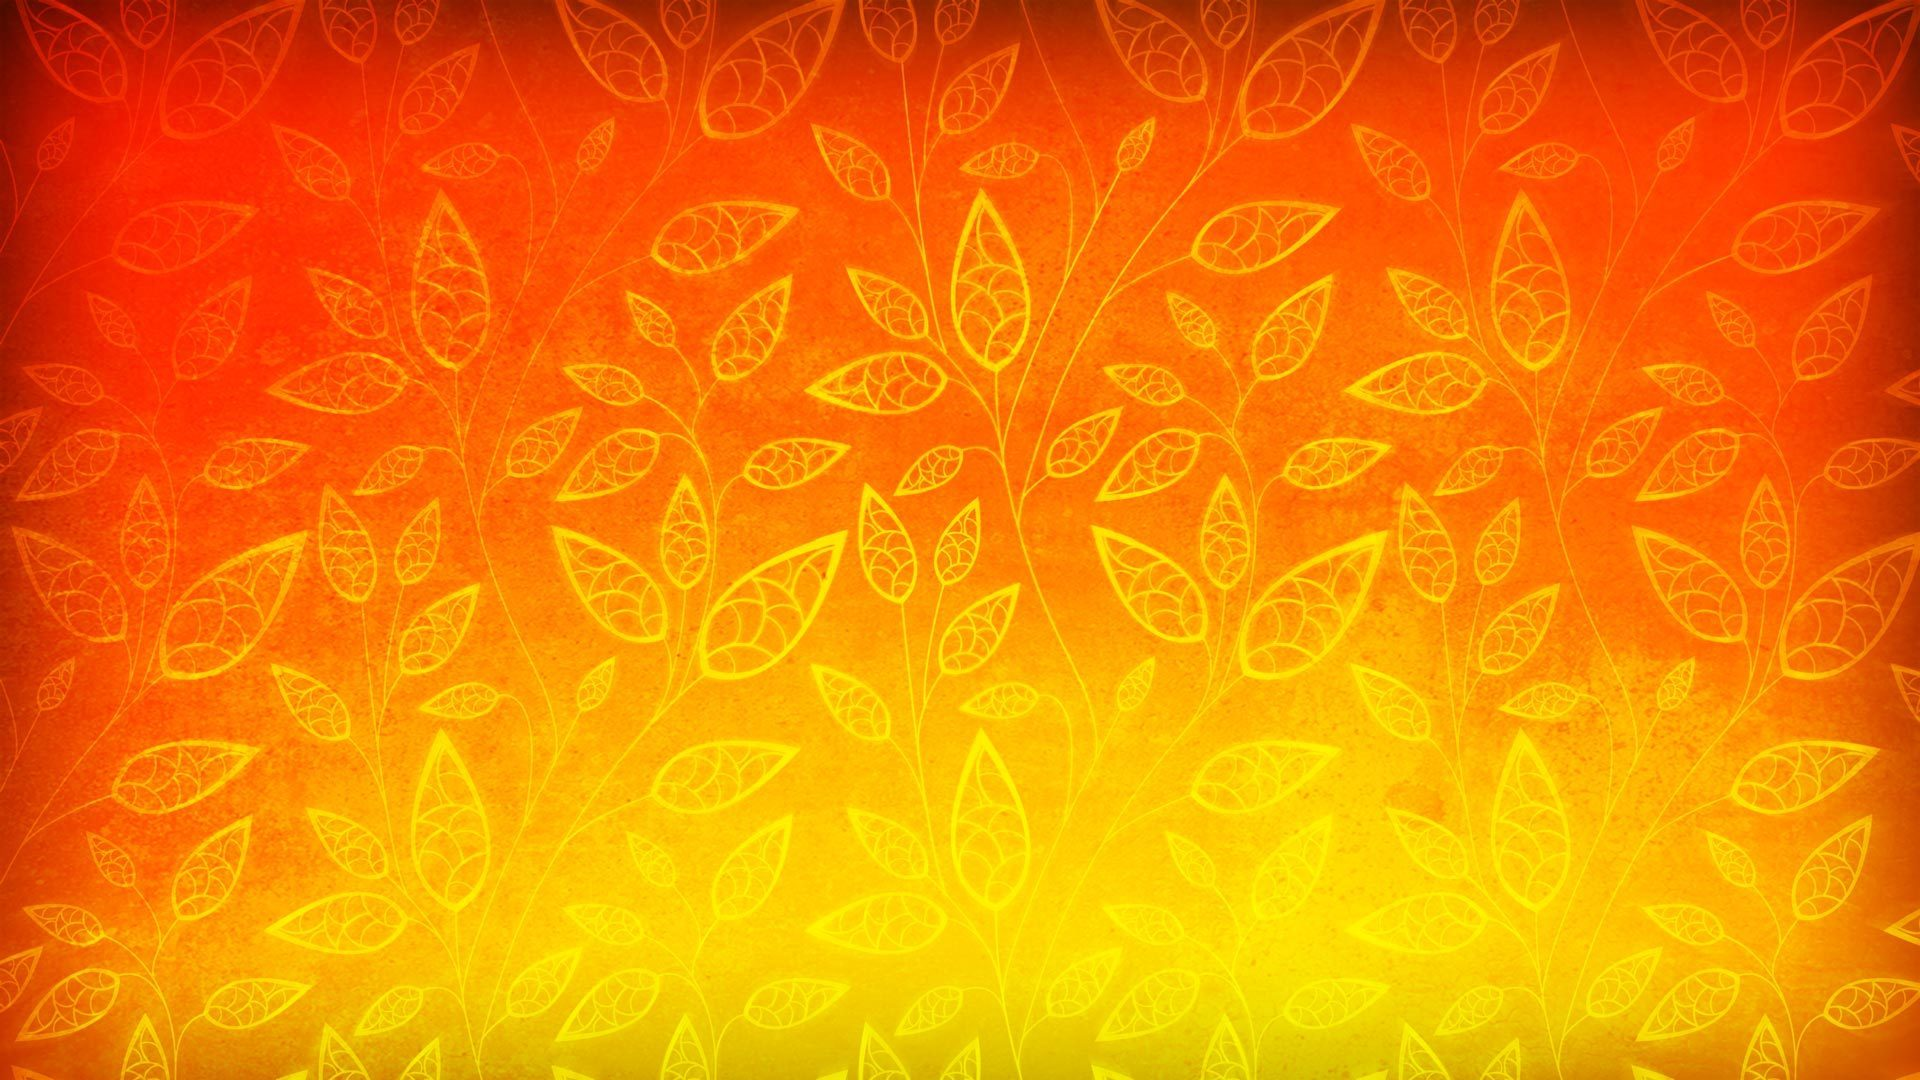 Fall Wallpaper Hd Photo - Full Hd Navratri Background , HD Wallpaper & Backgrounds